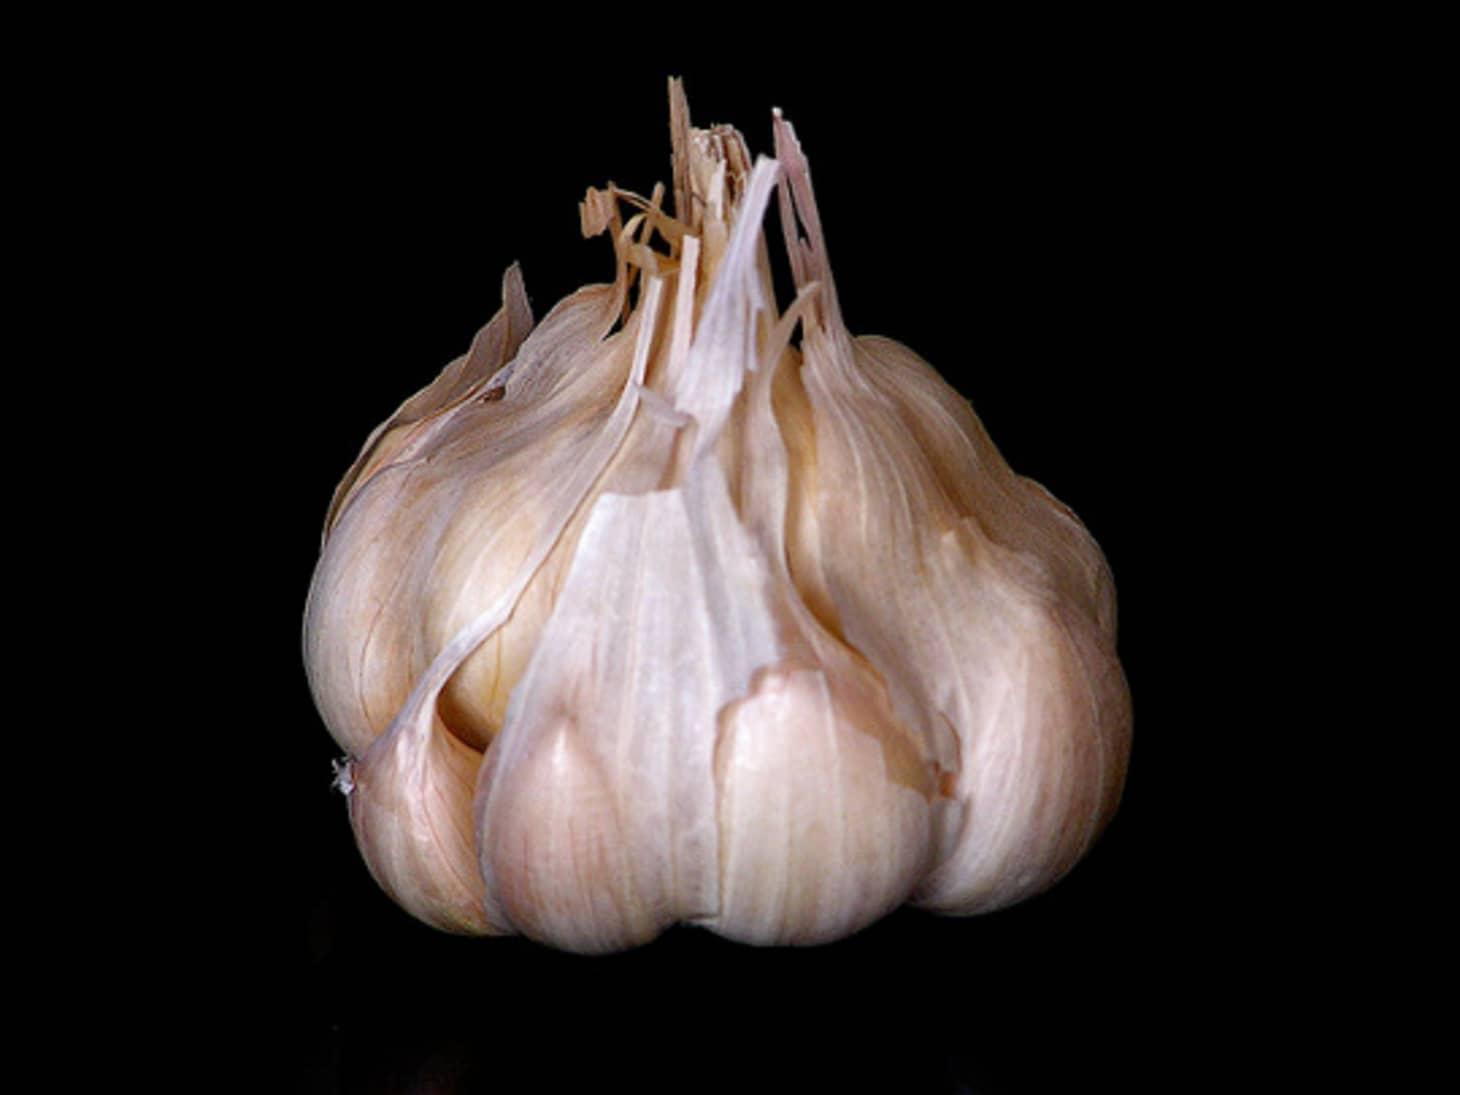 Who Knew? Garlic May Have Antibiotic Properties | Kitchn